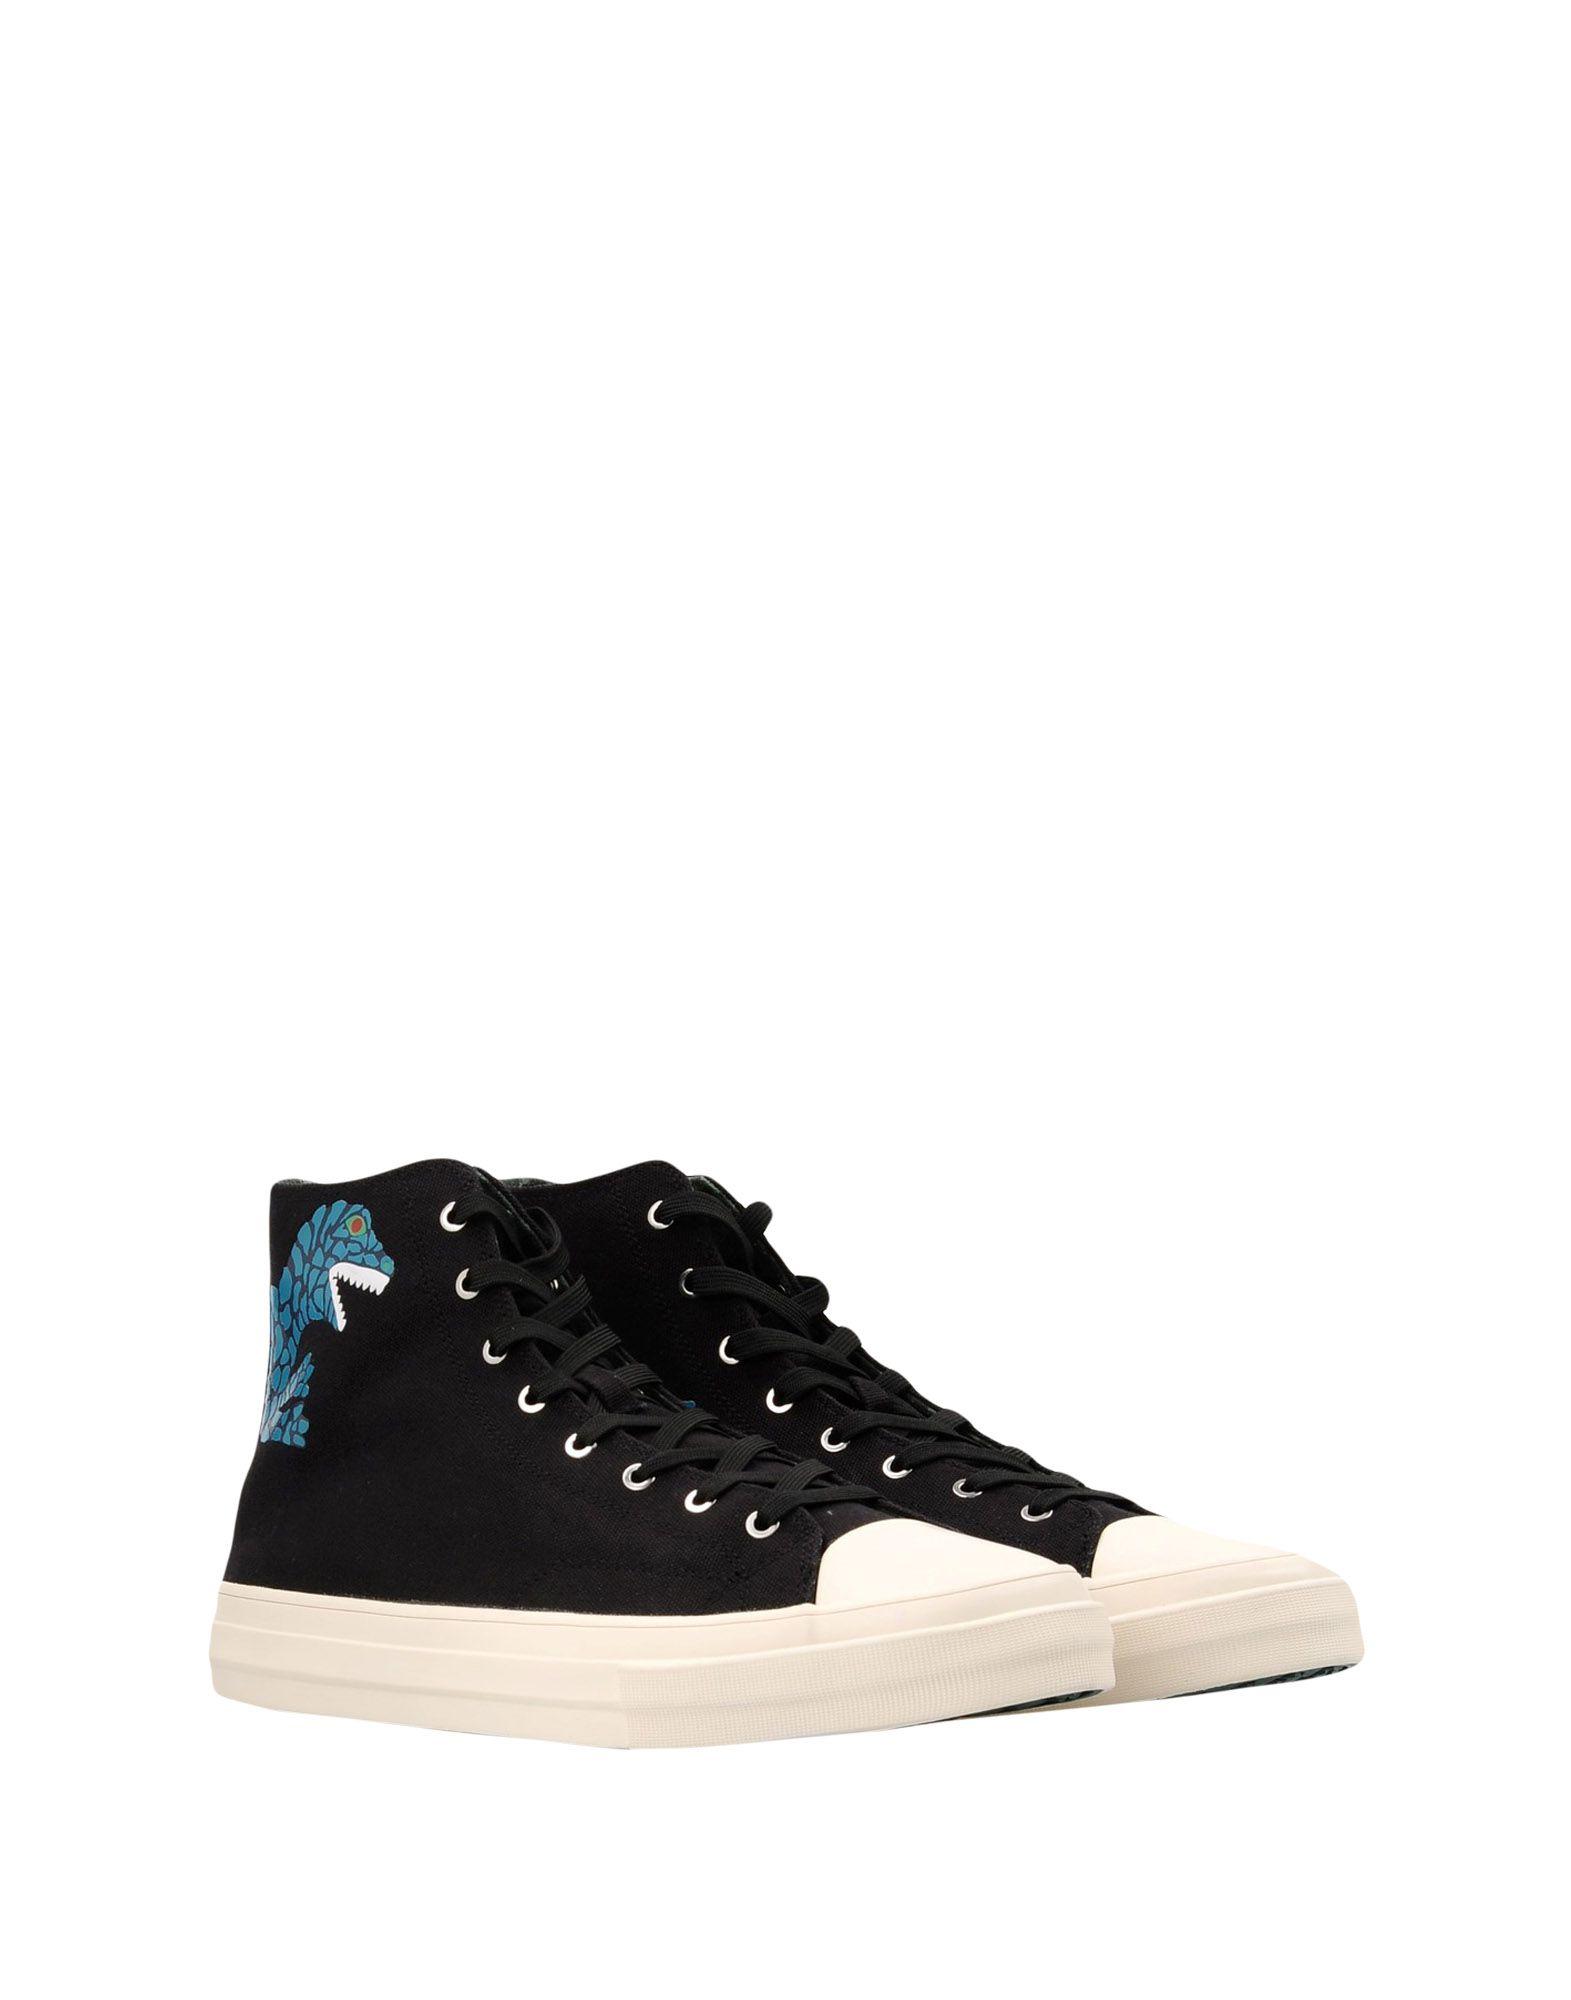 Sneakers Ps By Paul Smith Mens Shoe Kirk Black - Homme - Sneakers Ps By Paul Smith sur